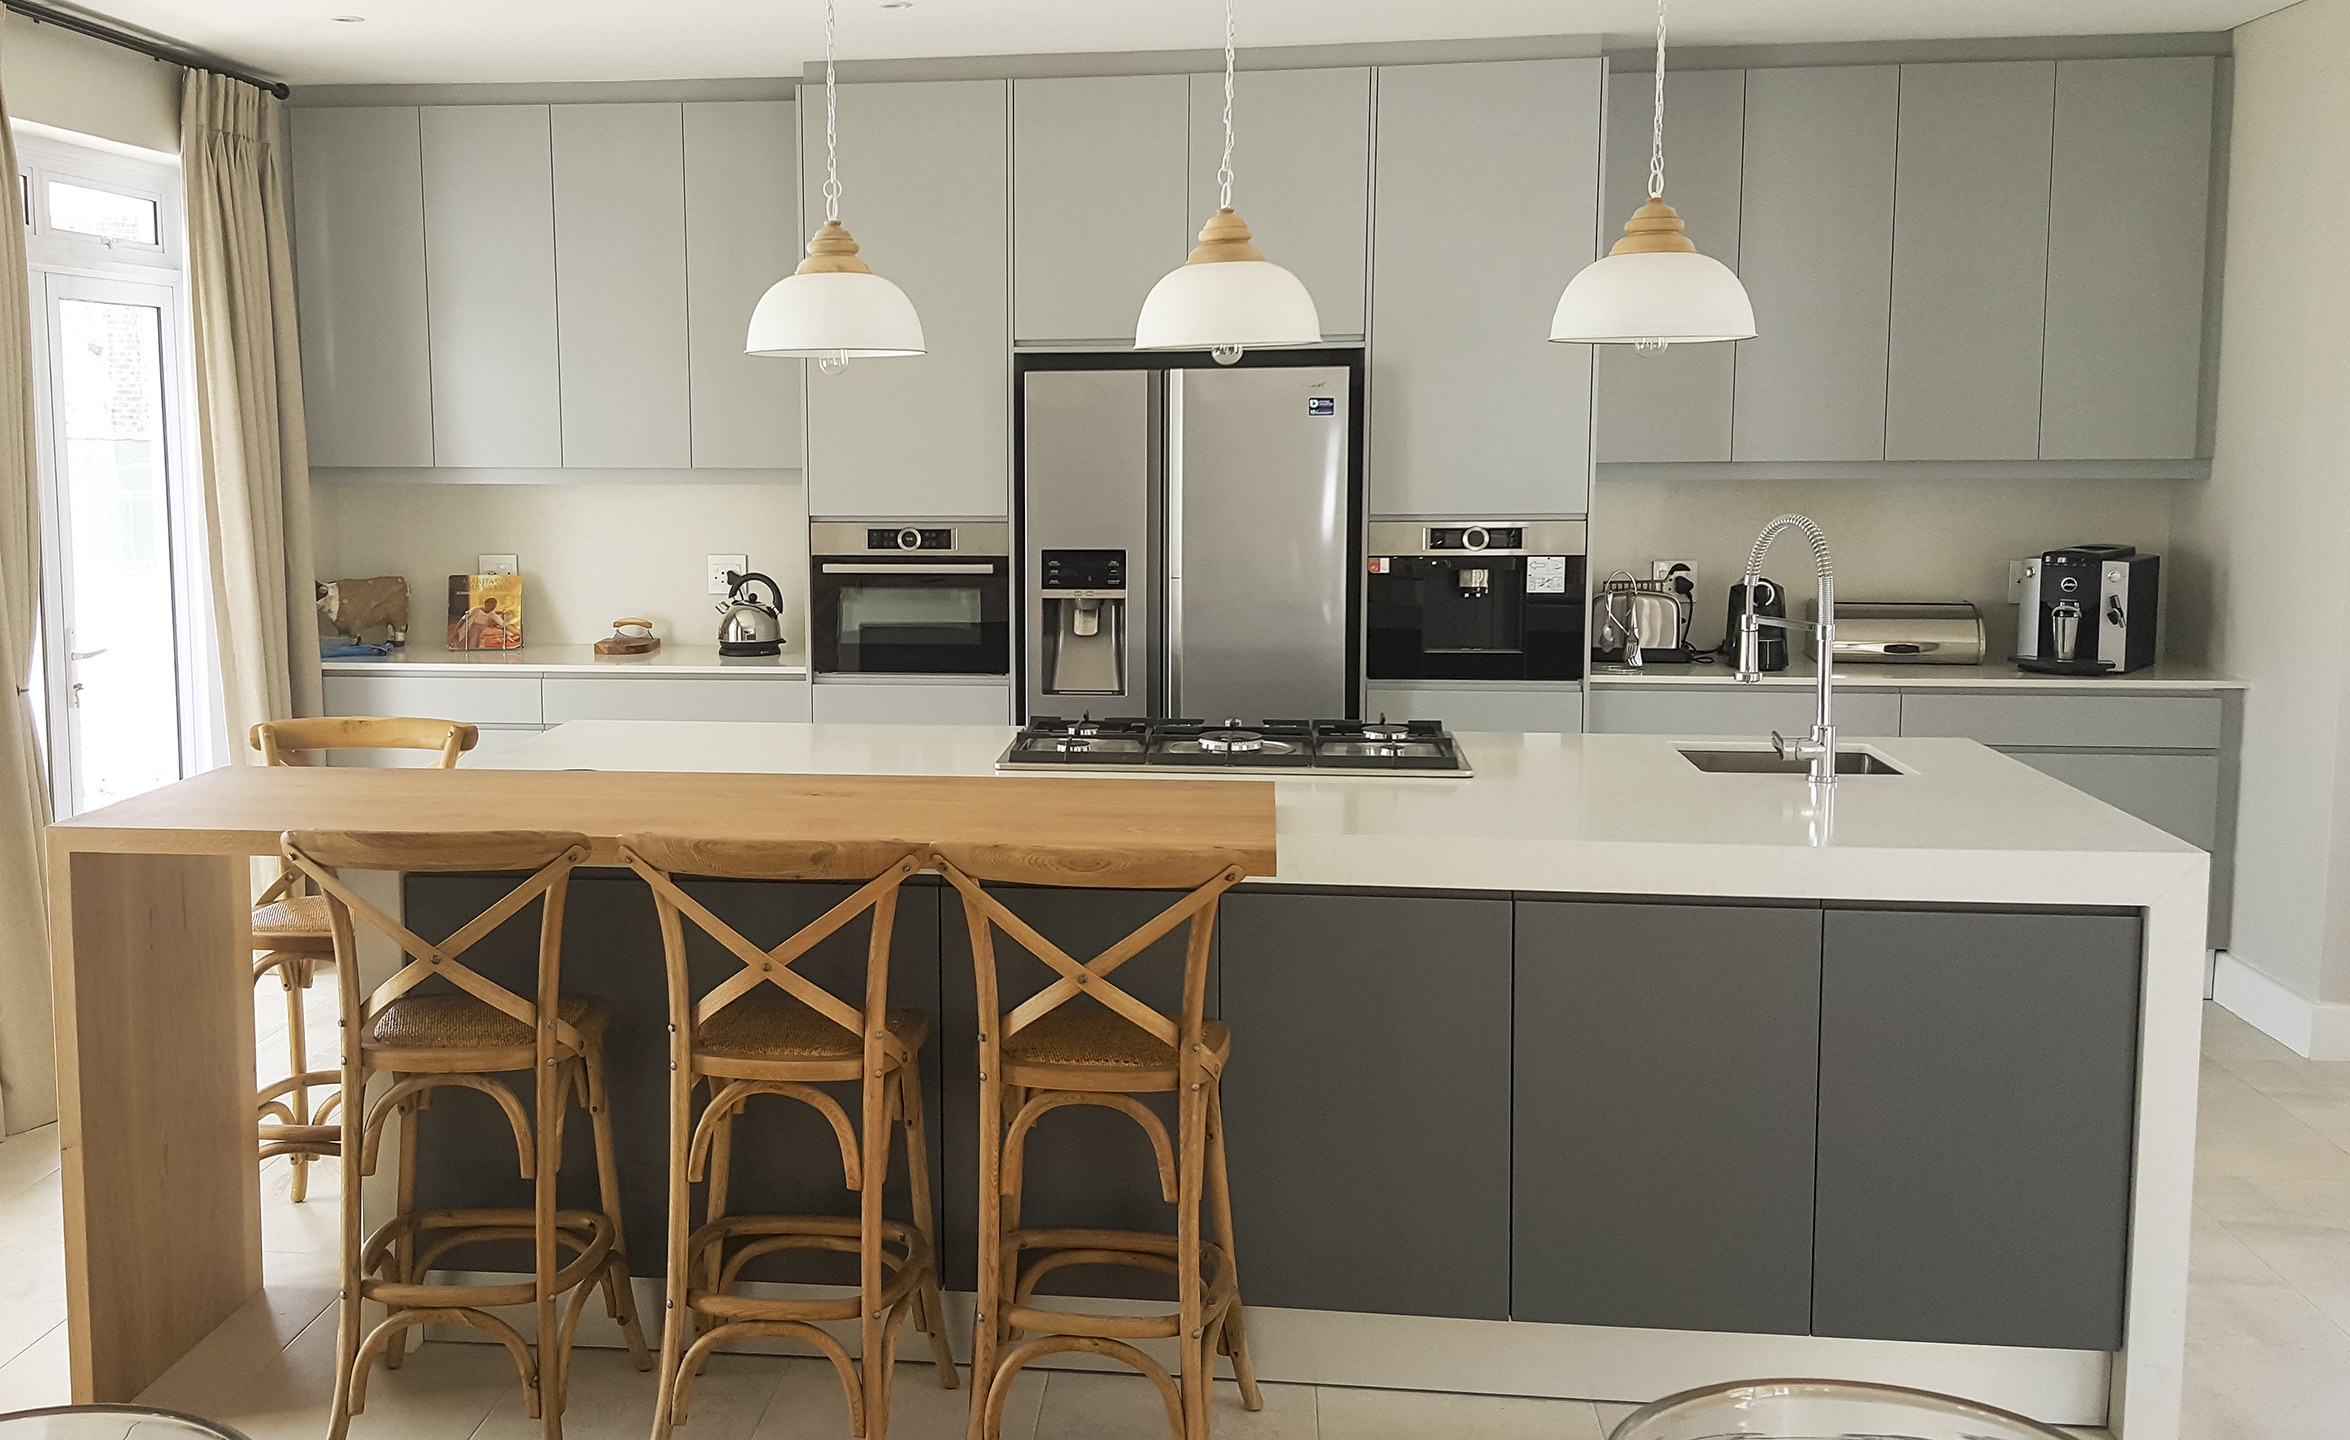 Cadan cupboards and niemandsland kitchens